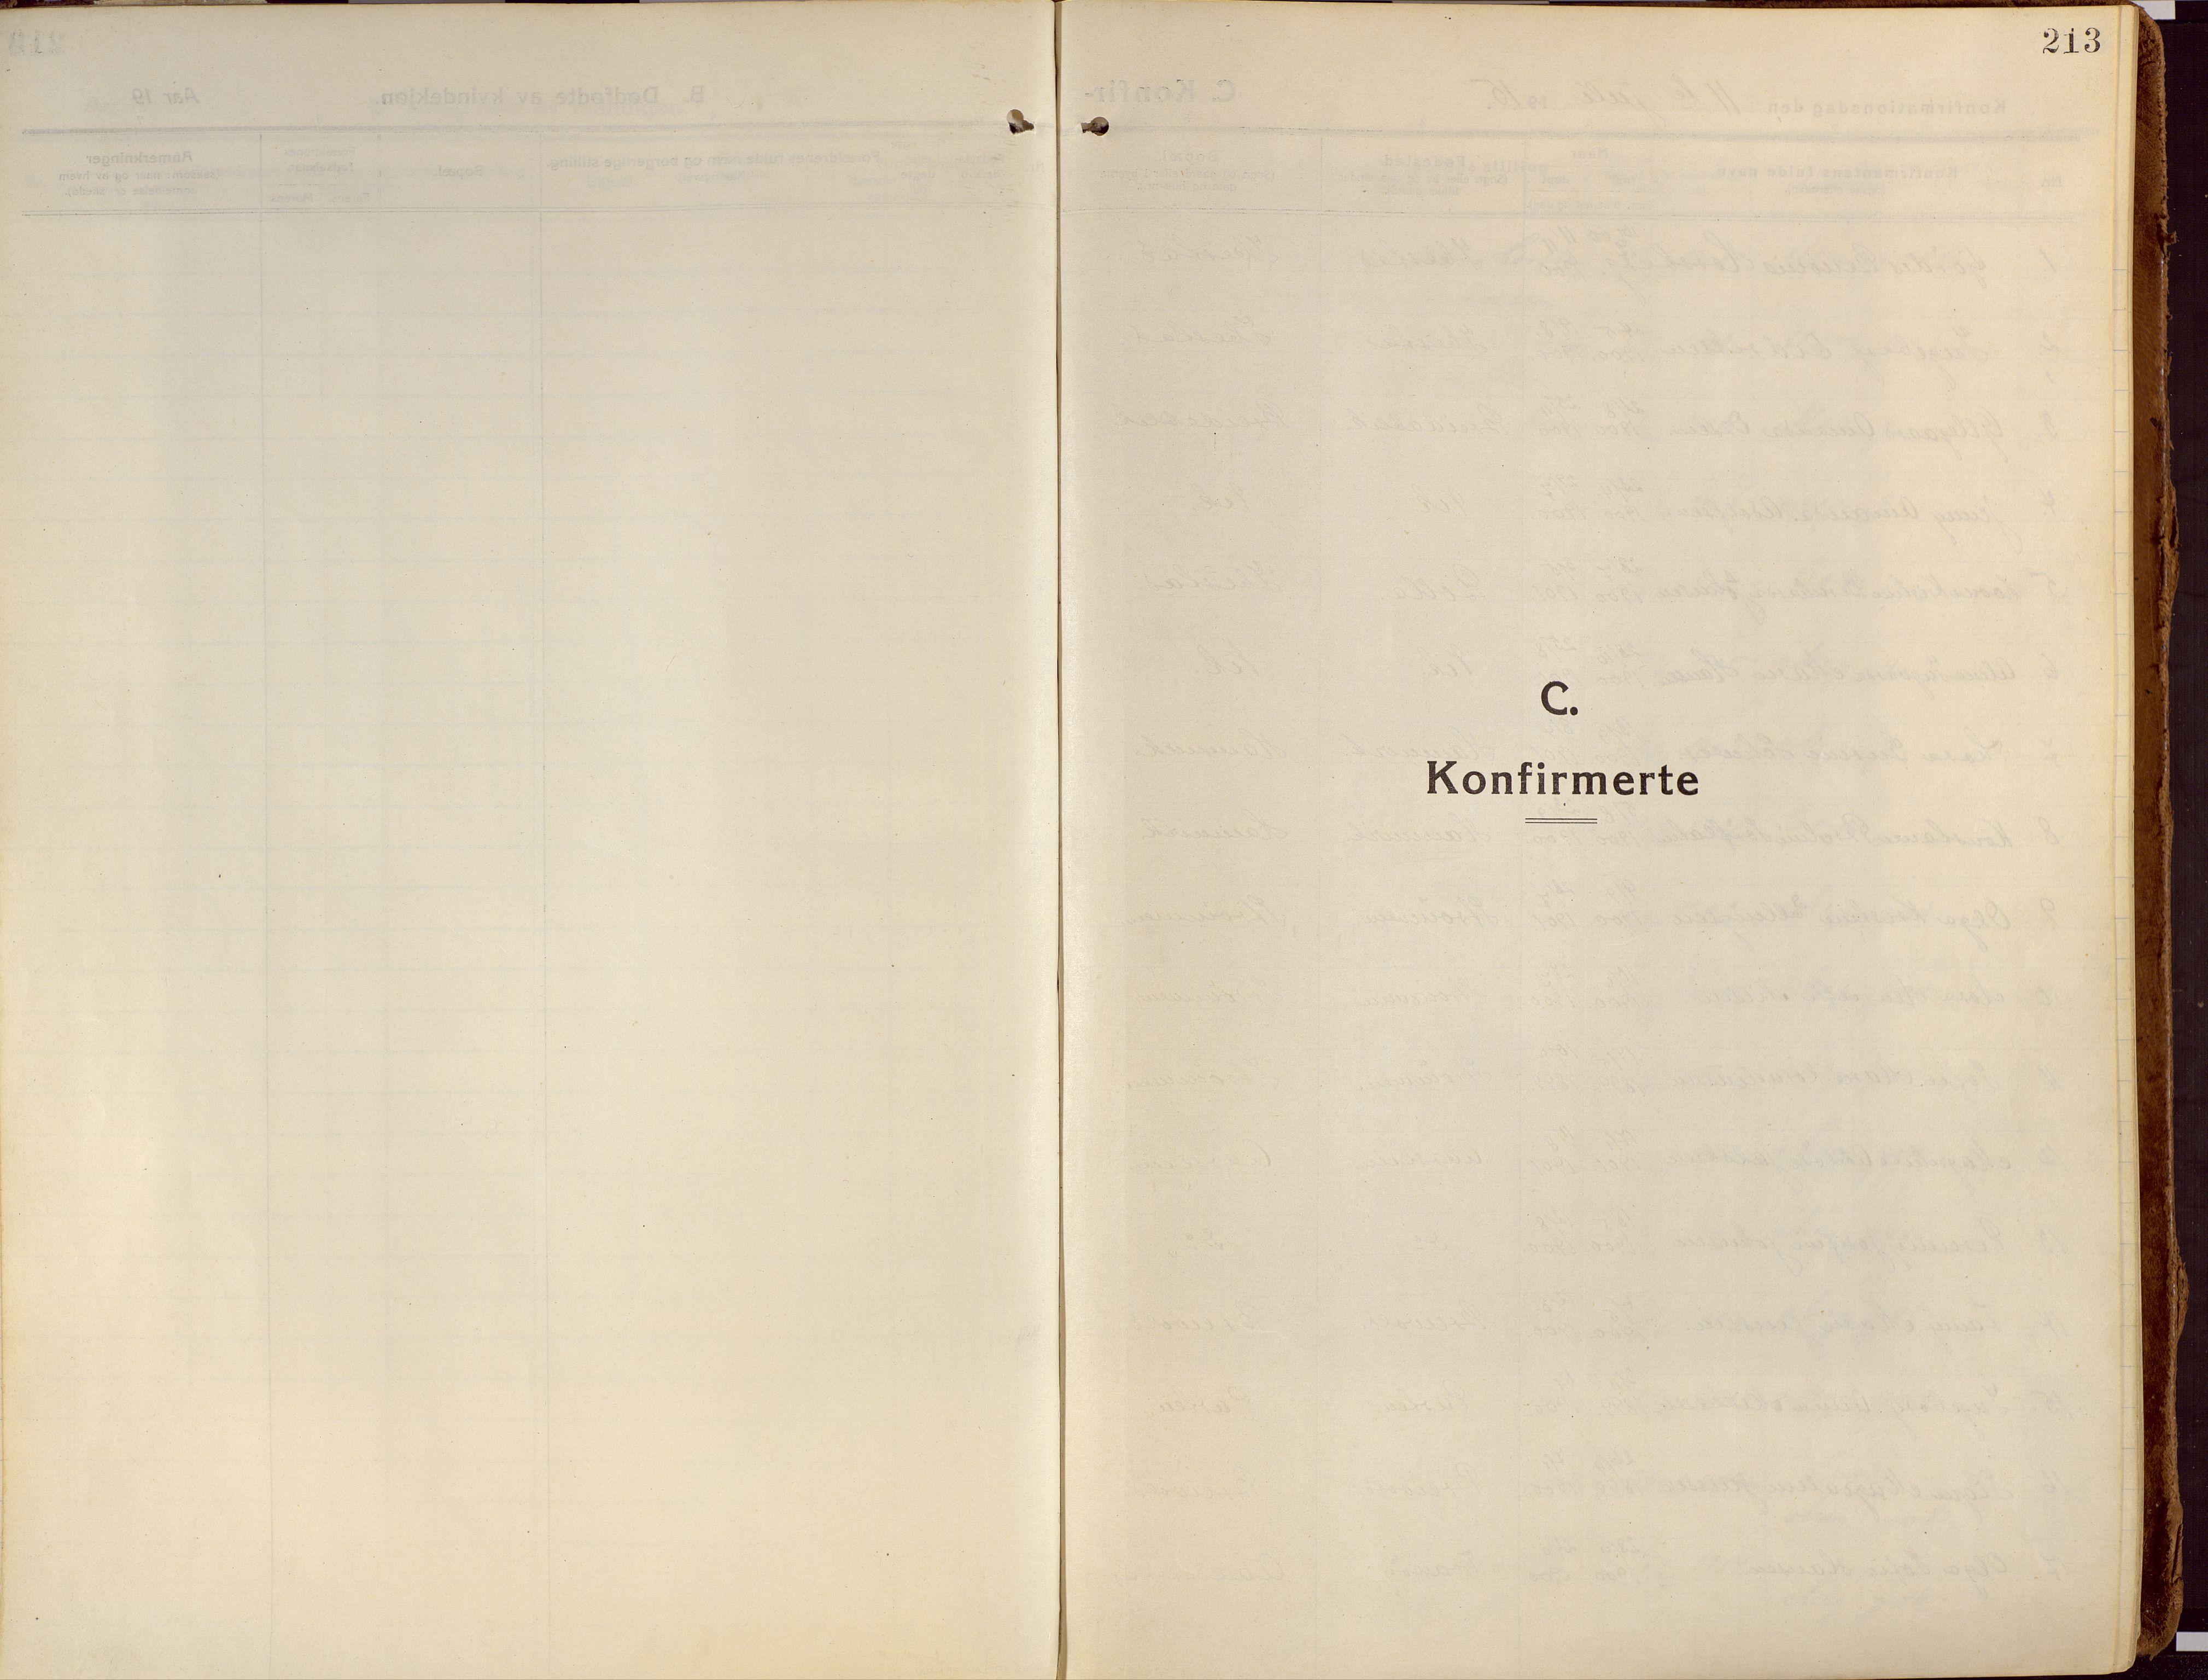 SATØ, Ibestad sokneprestembete, Ministerialbok nr. 18, 1915-1929, s. 213